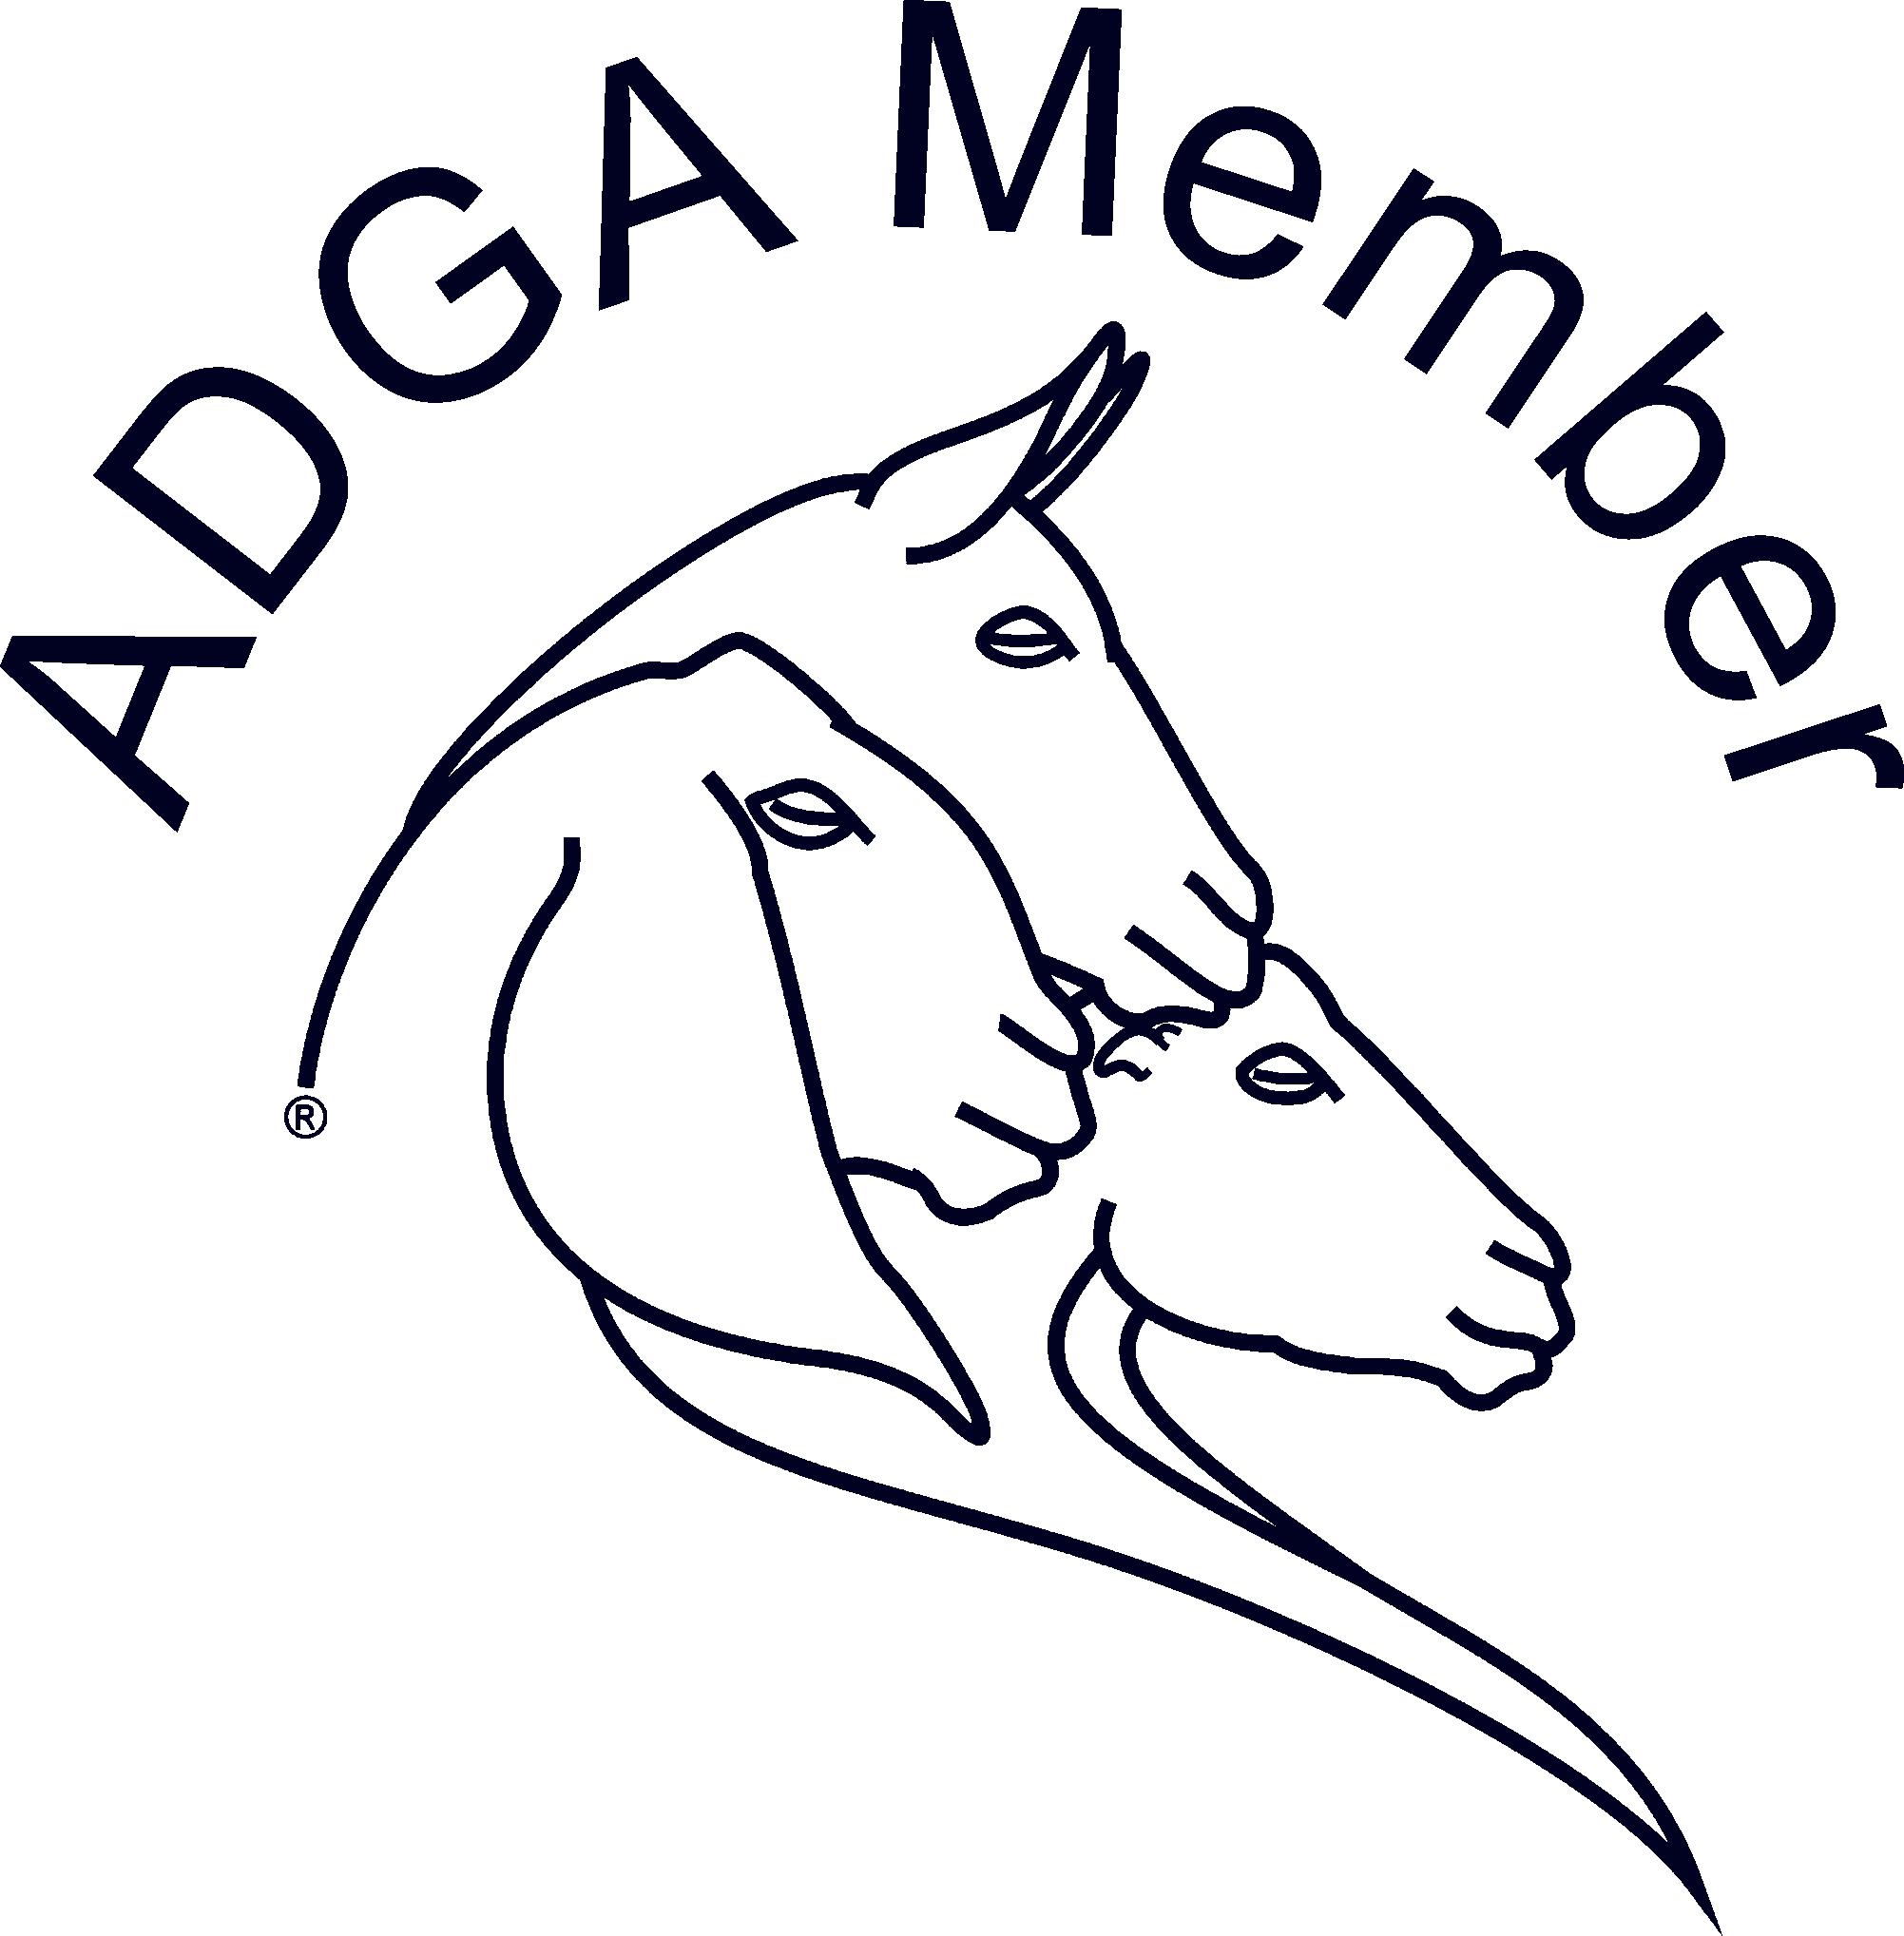 Image result for adga member image